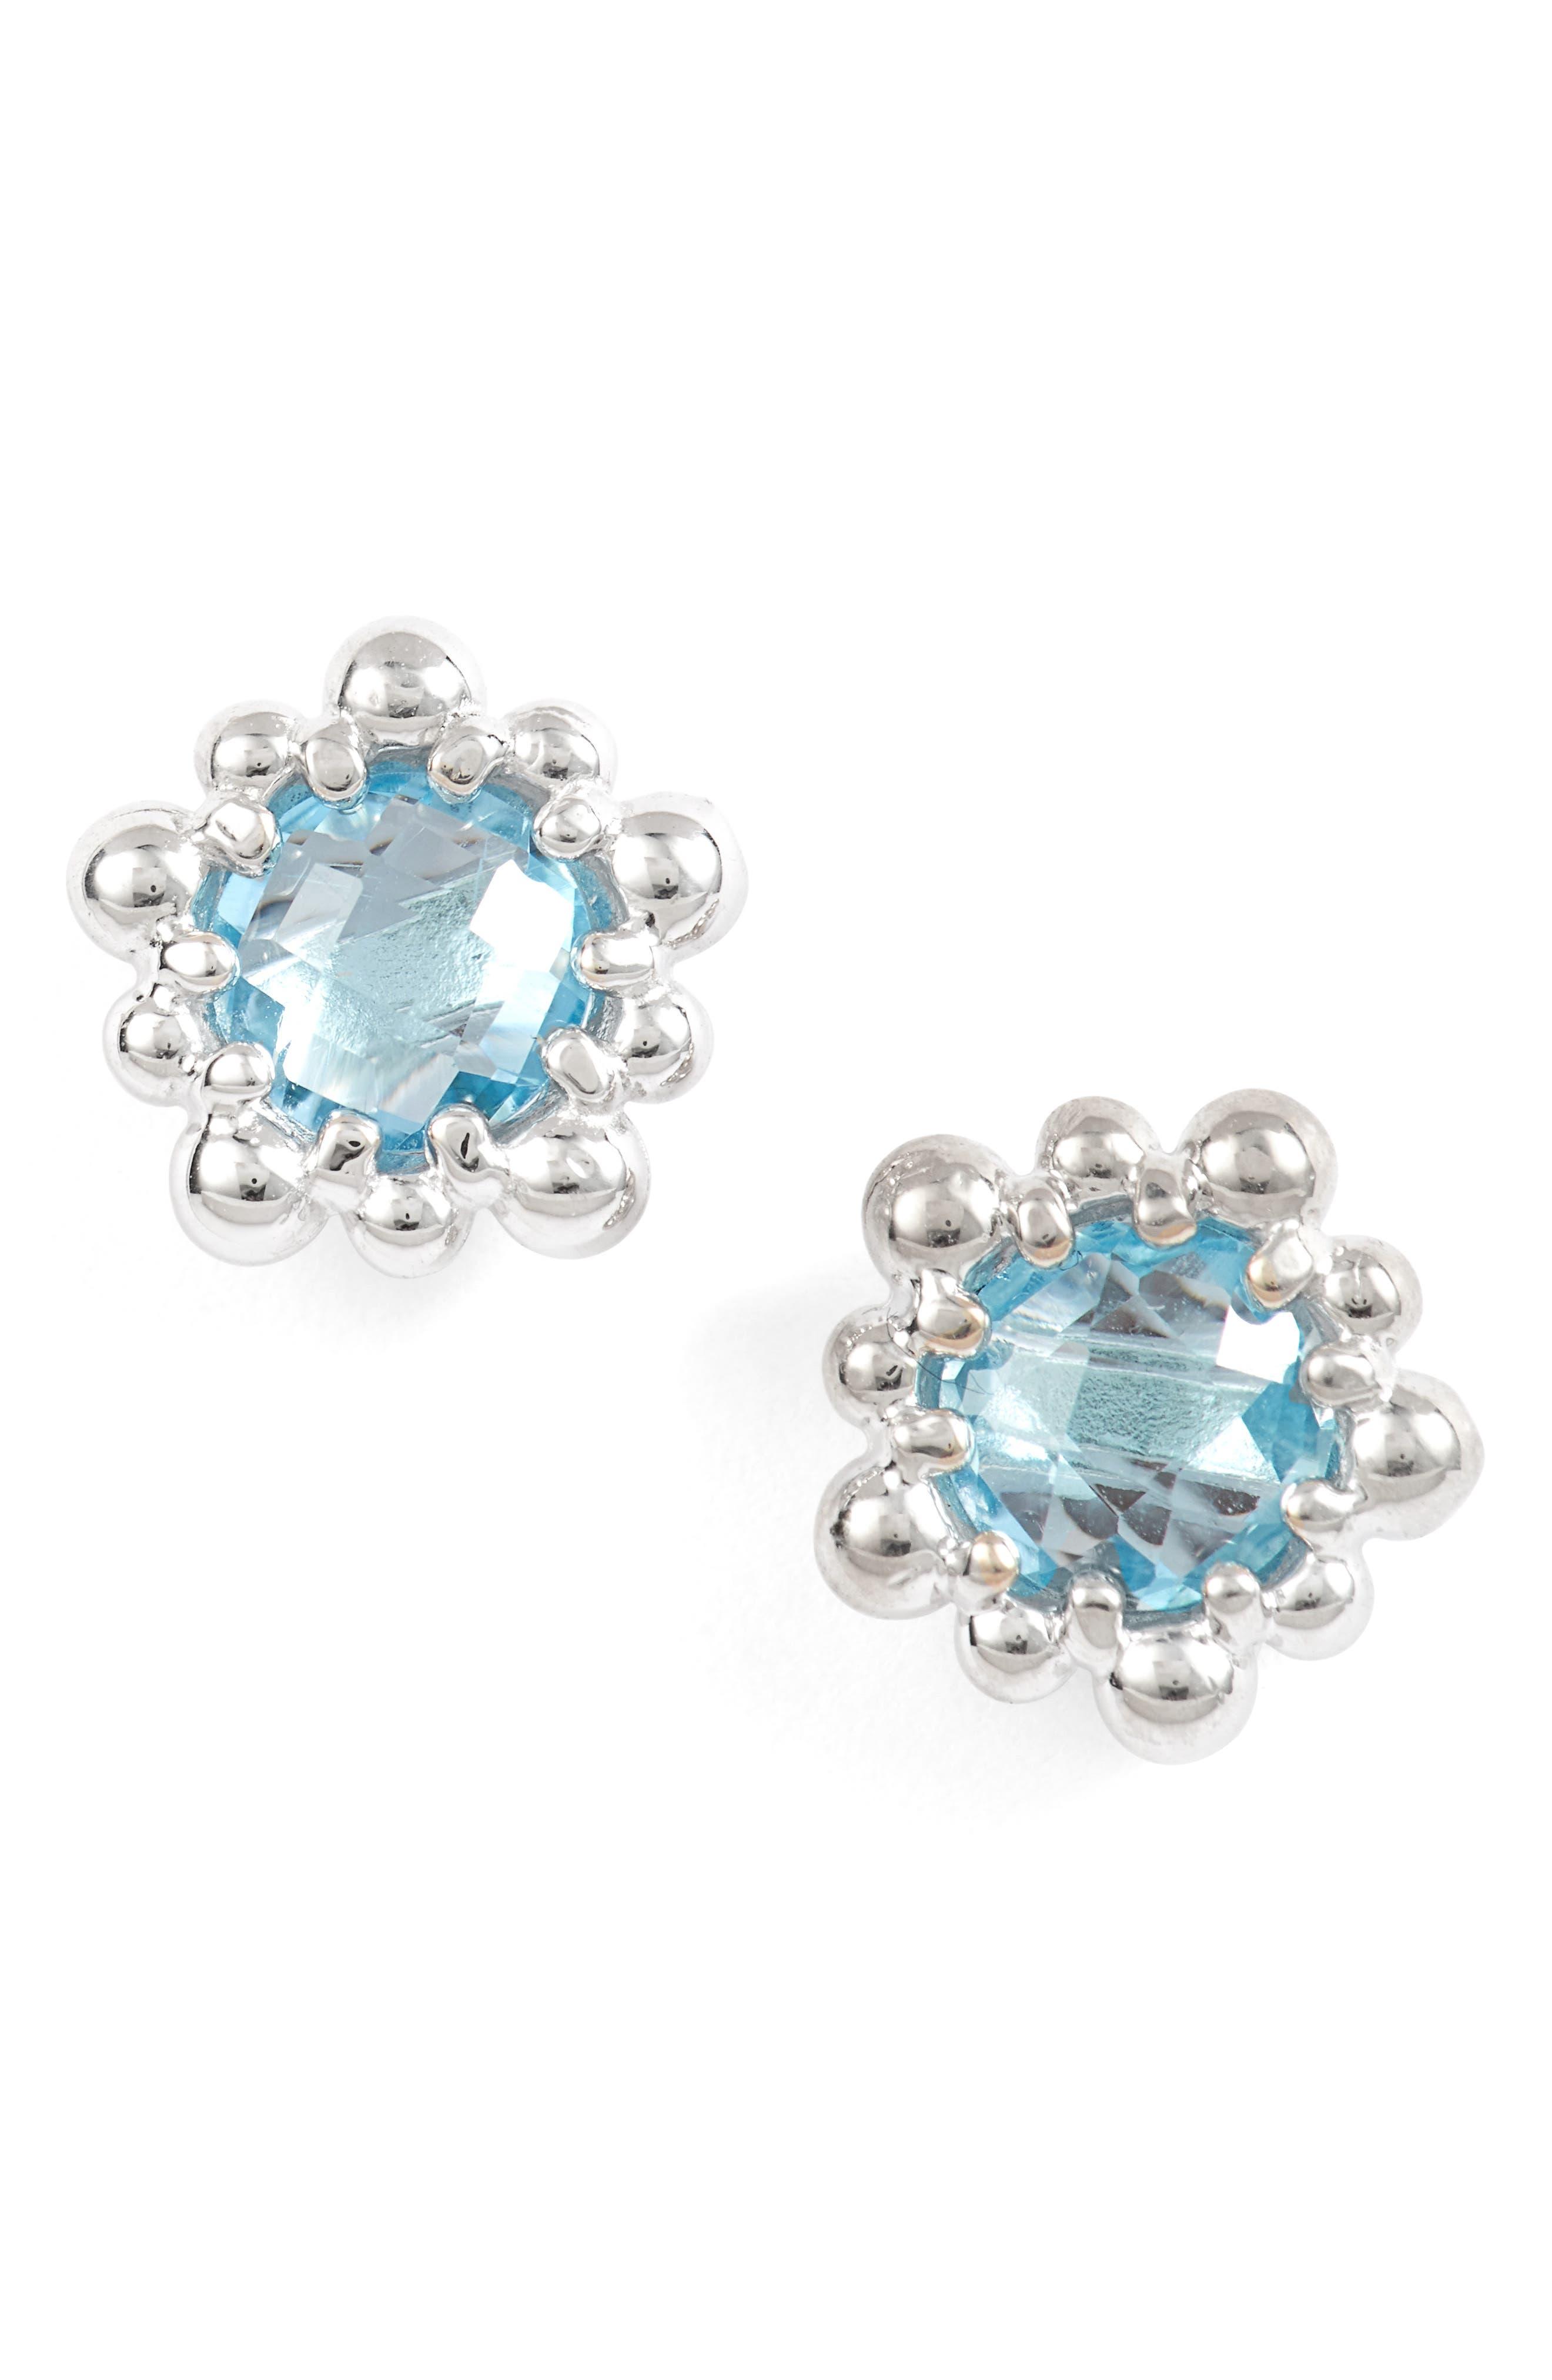 Micro Dew Drop Topaz Earrings,                         Main,                         color, 040